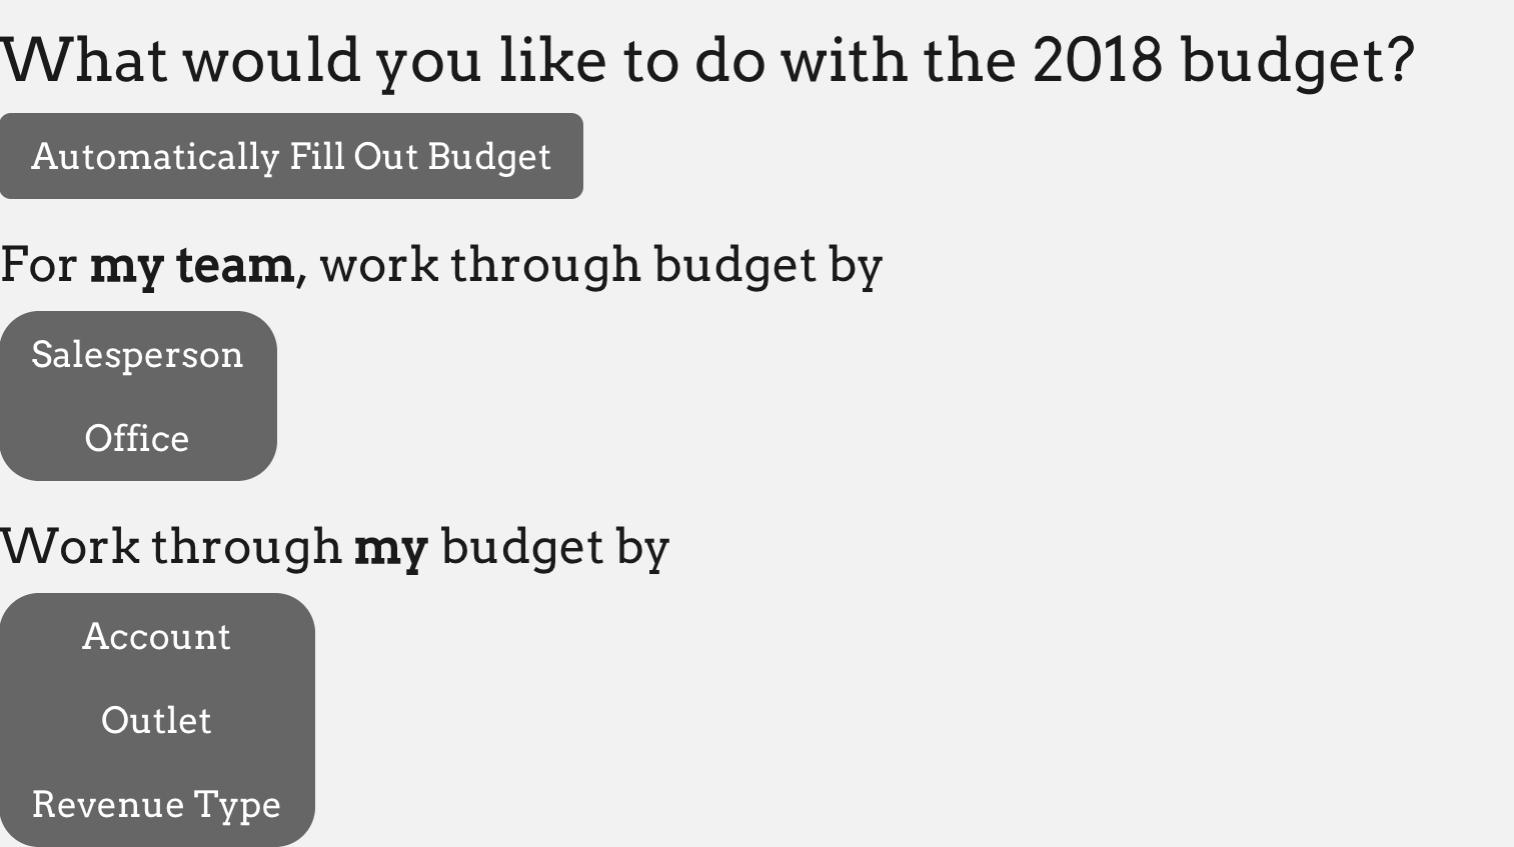 BudgetFocus-193704-edited.png